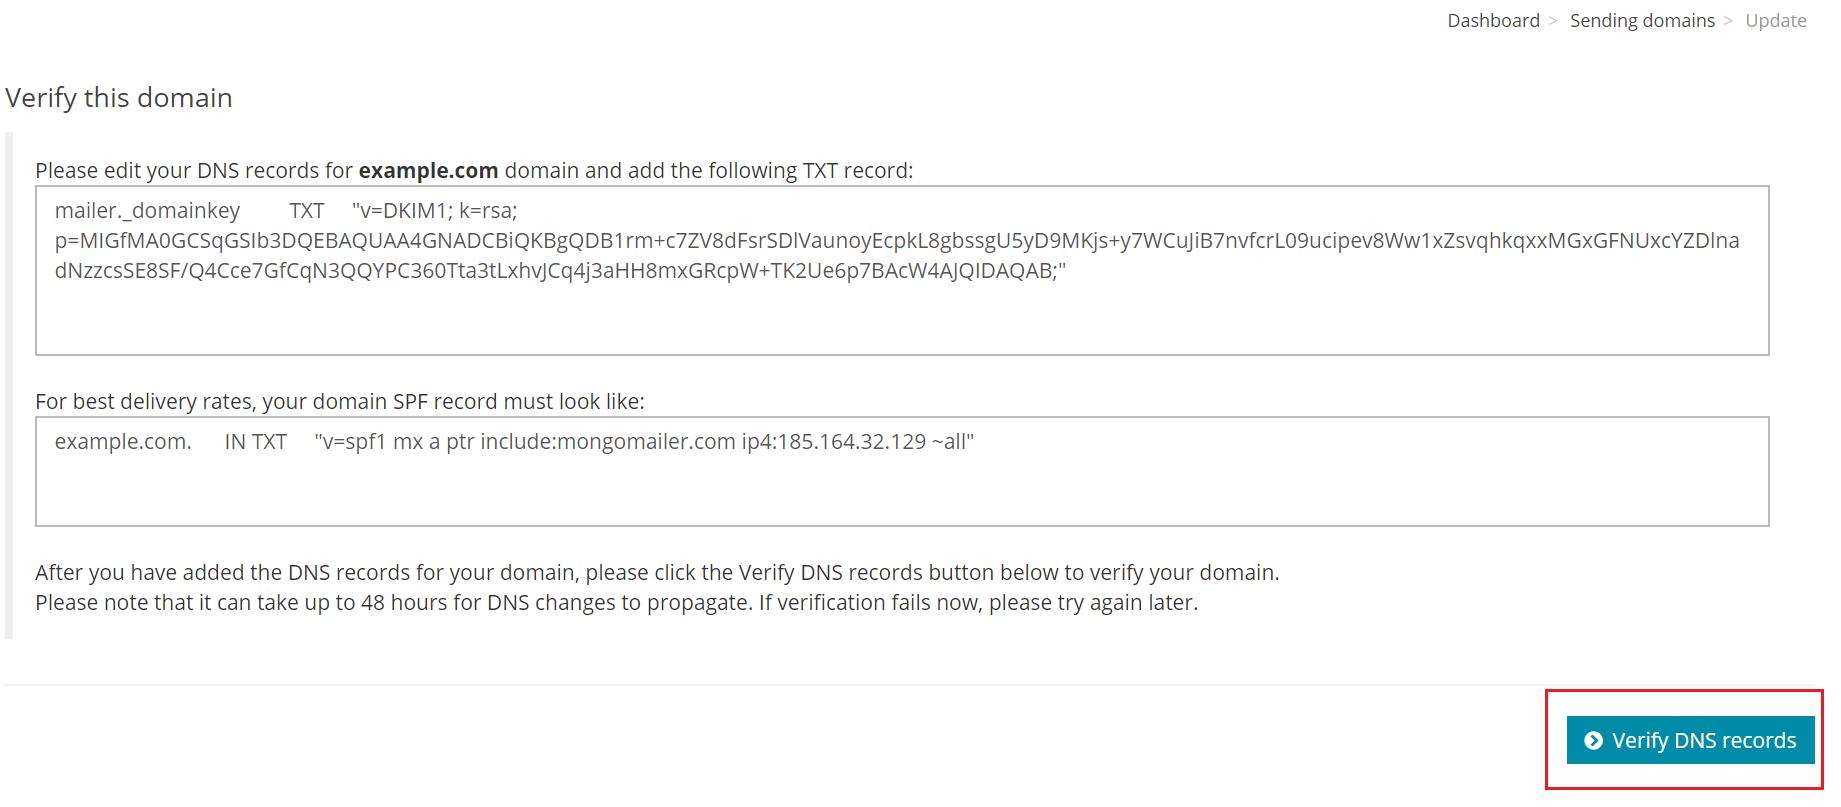 Verify the DNS